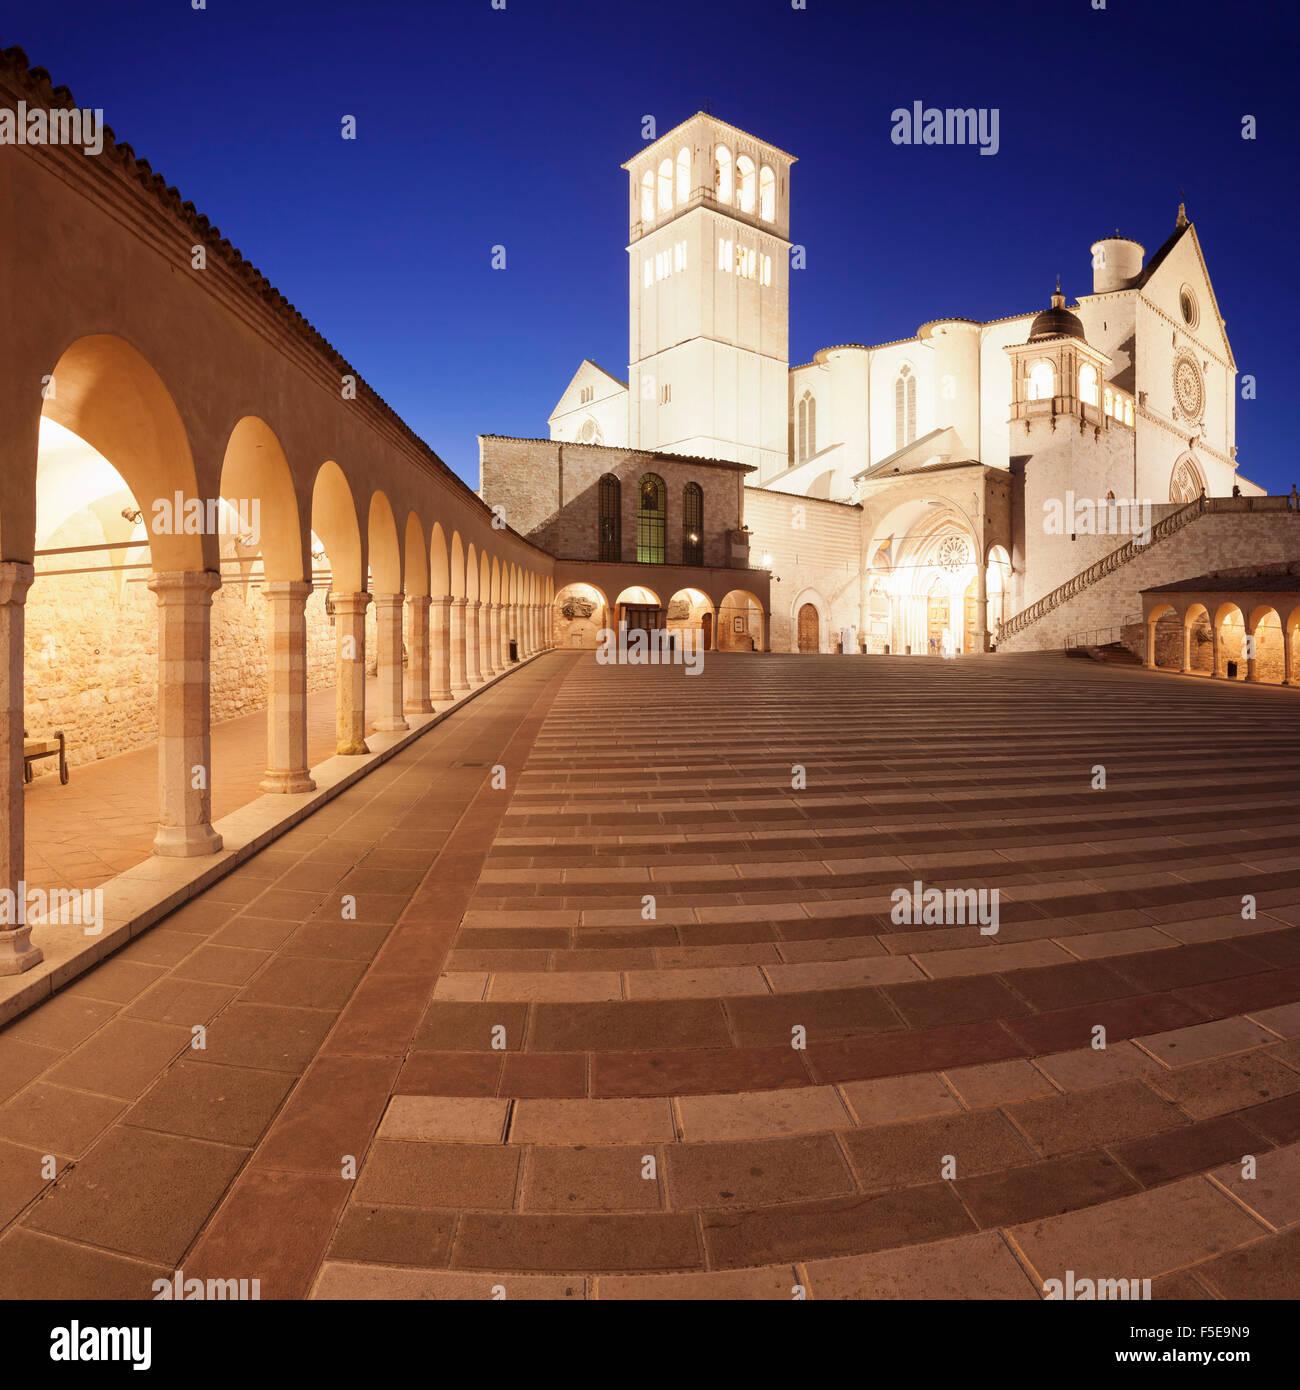 Basilica of San Francesco, UNESCO World Heritage Site, Assisi, Perugia District, Umbria, Italy, Europe - Stock Image